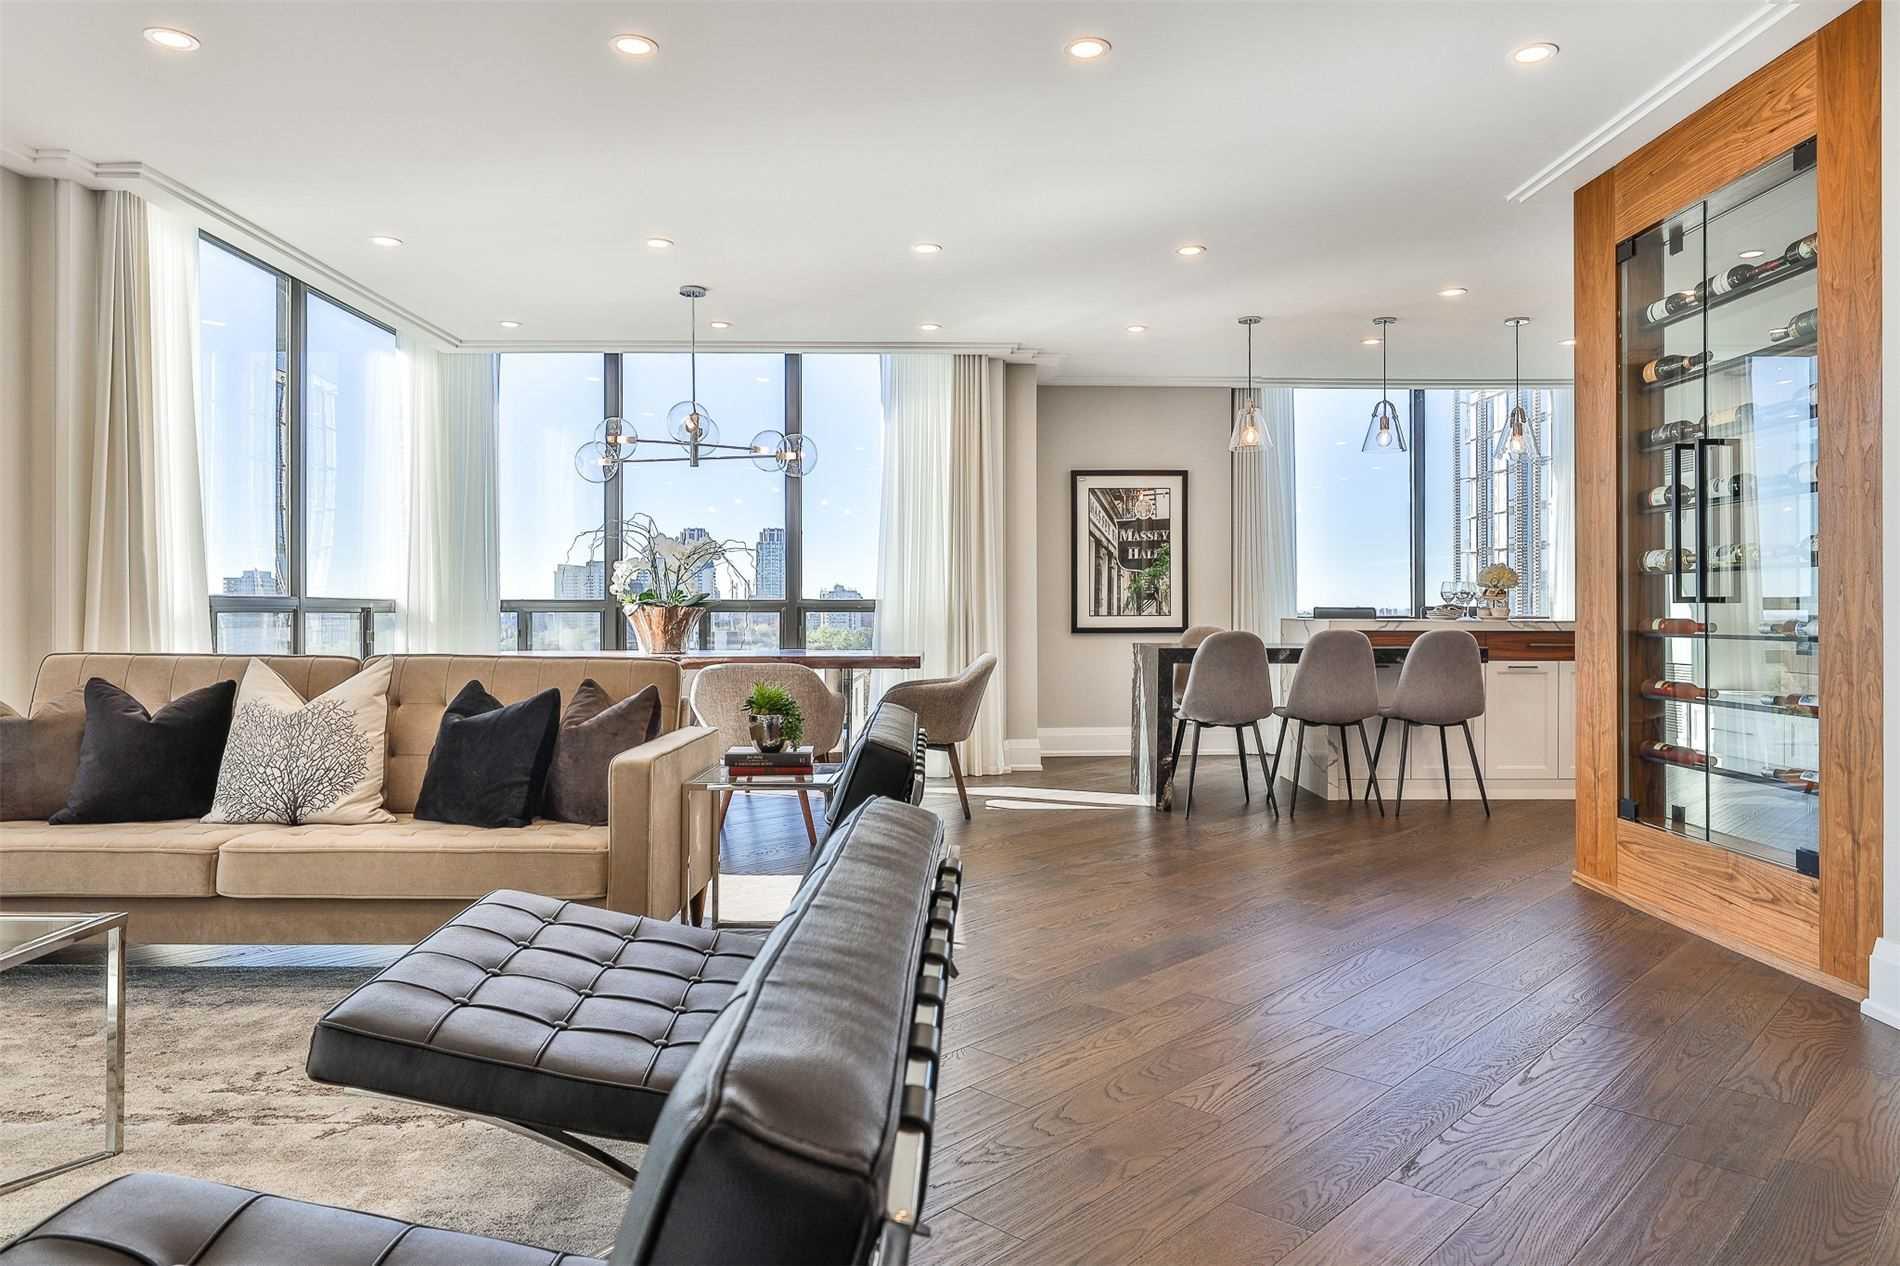 1404 - 619 Avenue Rd - Yonge-St. Clair Condo Apt for sale, 2 Bedrooms (C5409692) - #1